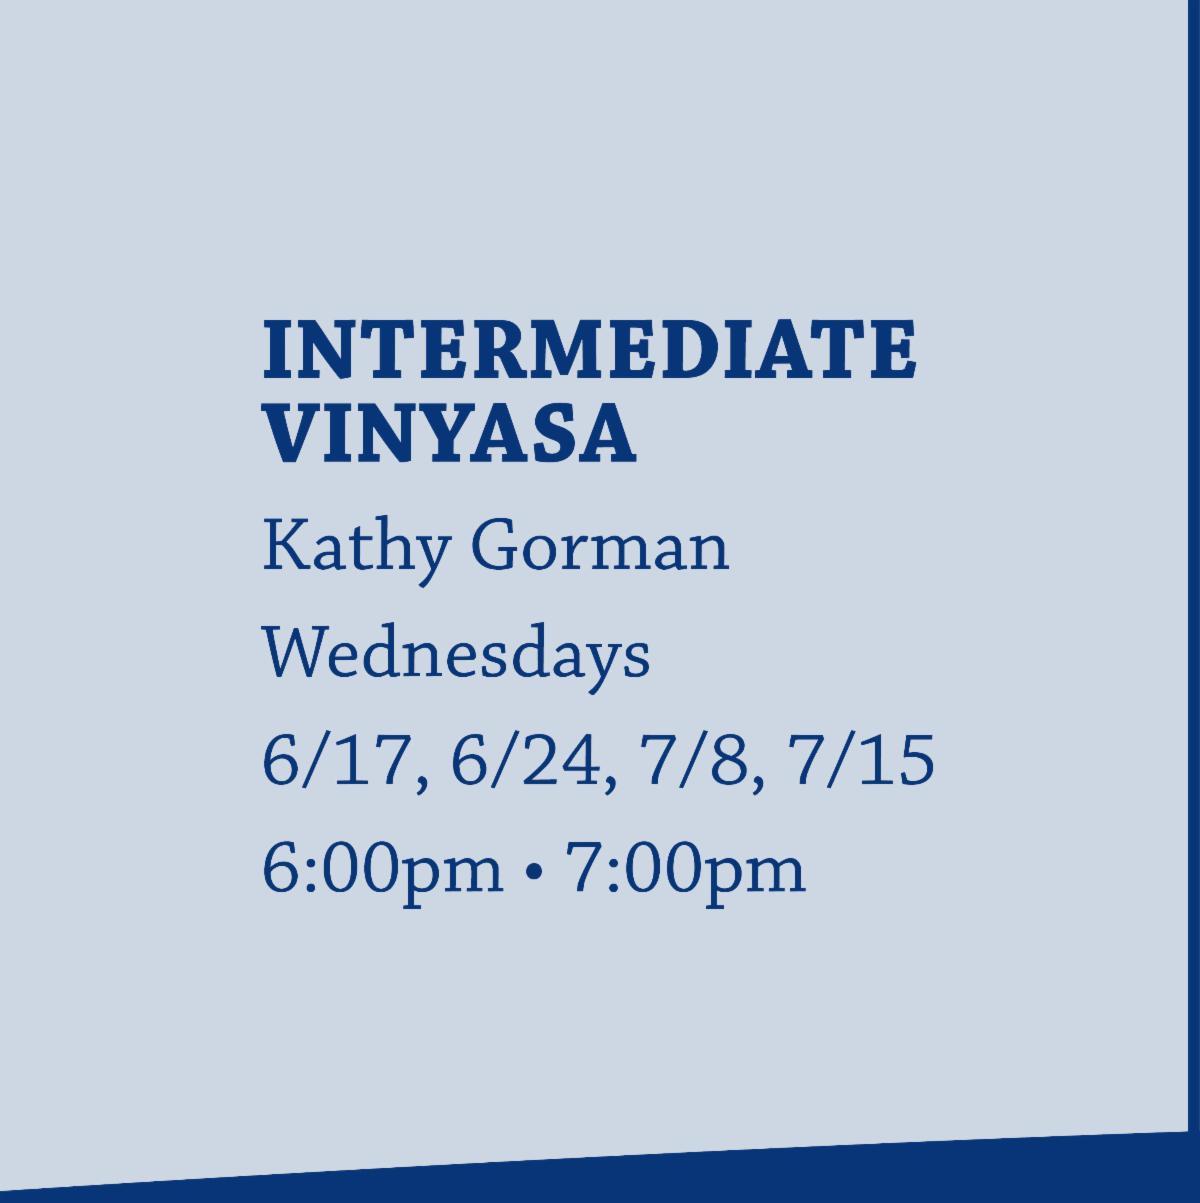 Intermediate Vinyasa with Kathy Gorman on Wednesdays from 6:00pm-7:00pm